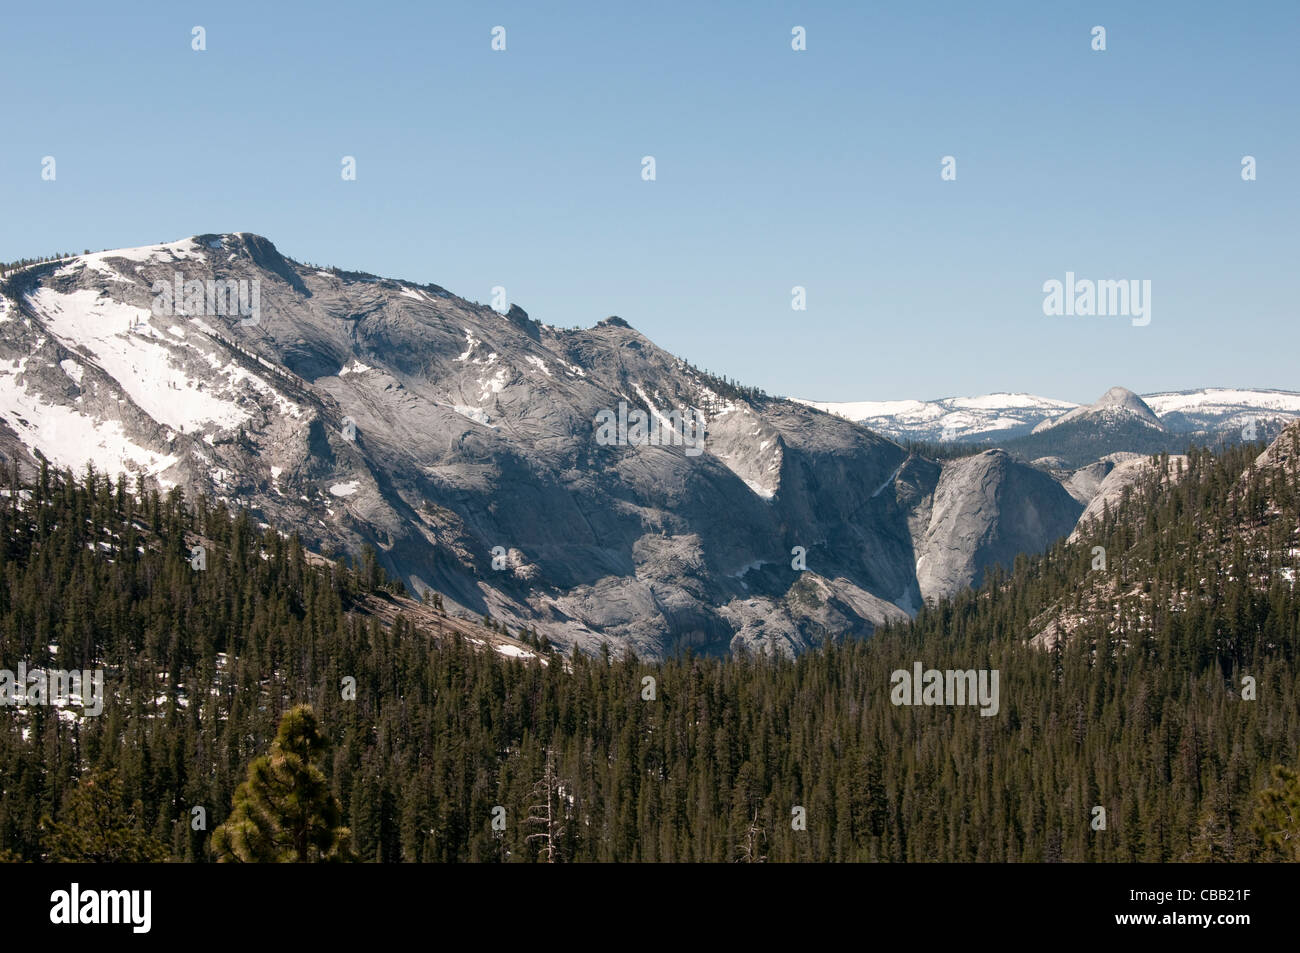 Granite scenic rock slabs mountain high country Yosemite National Park - Stock Image